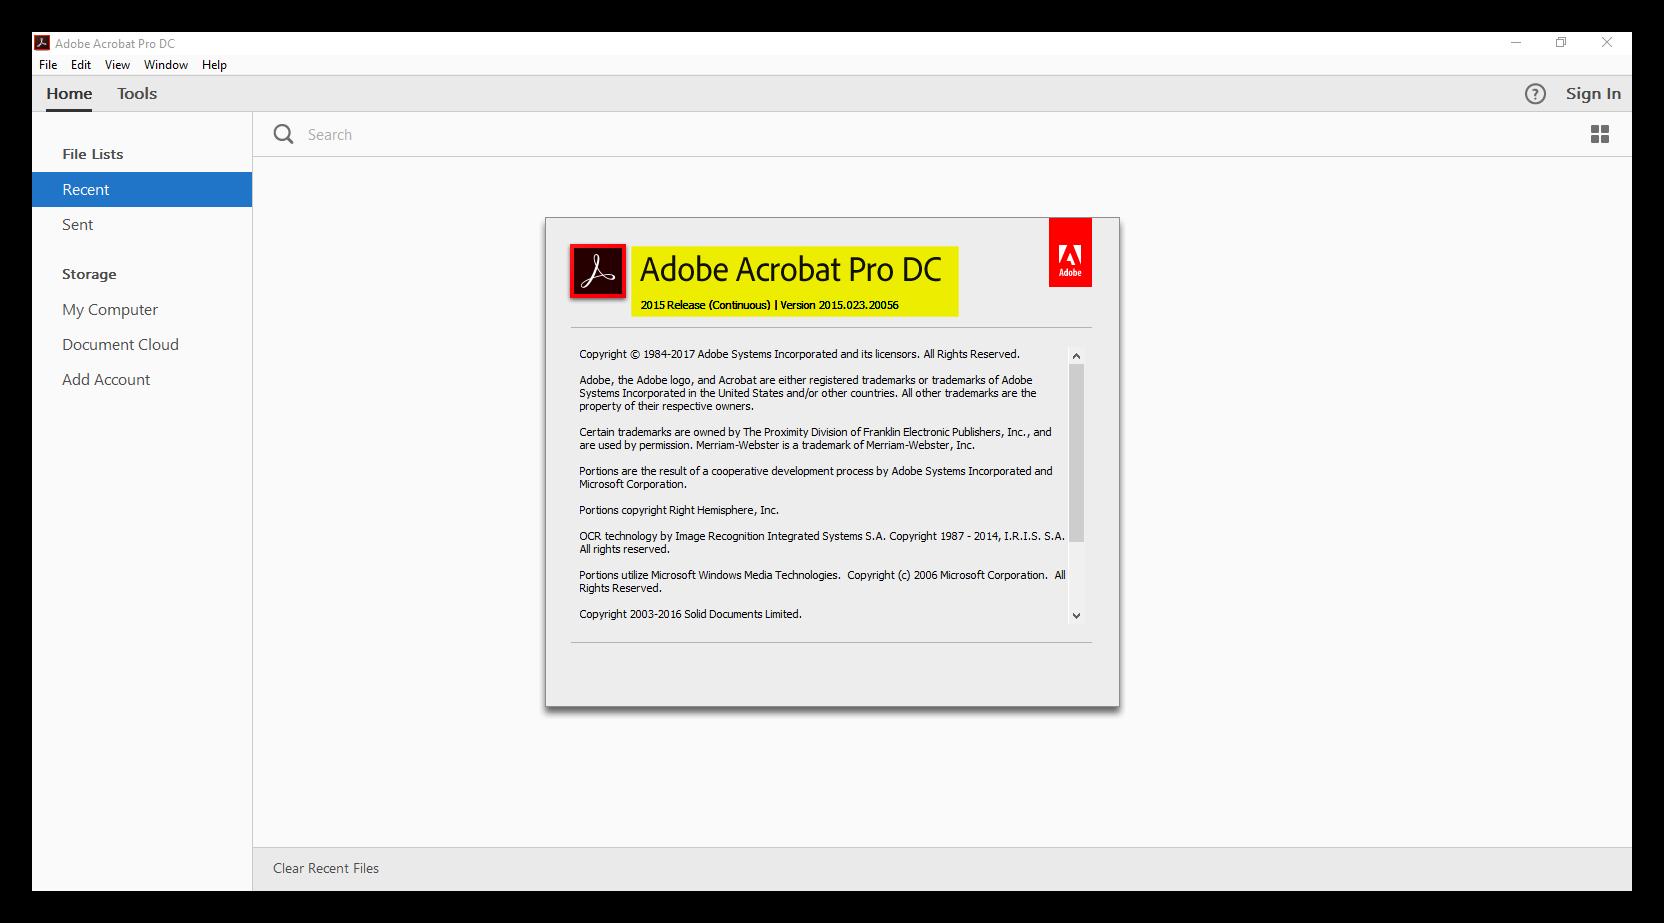 acrobat pro dc mac torrent download